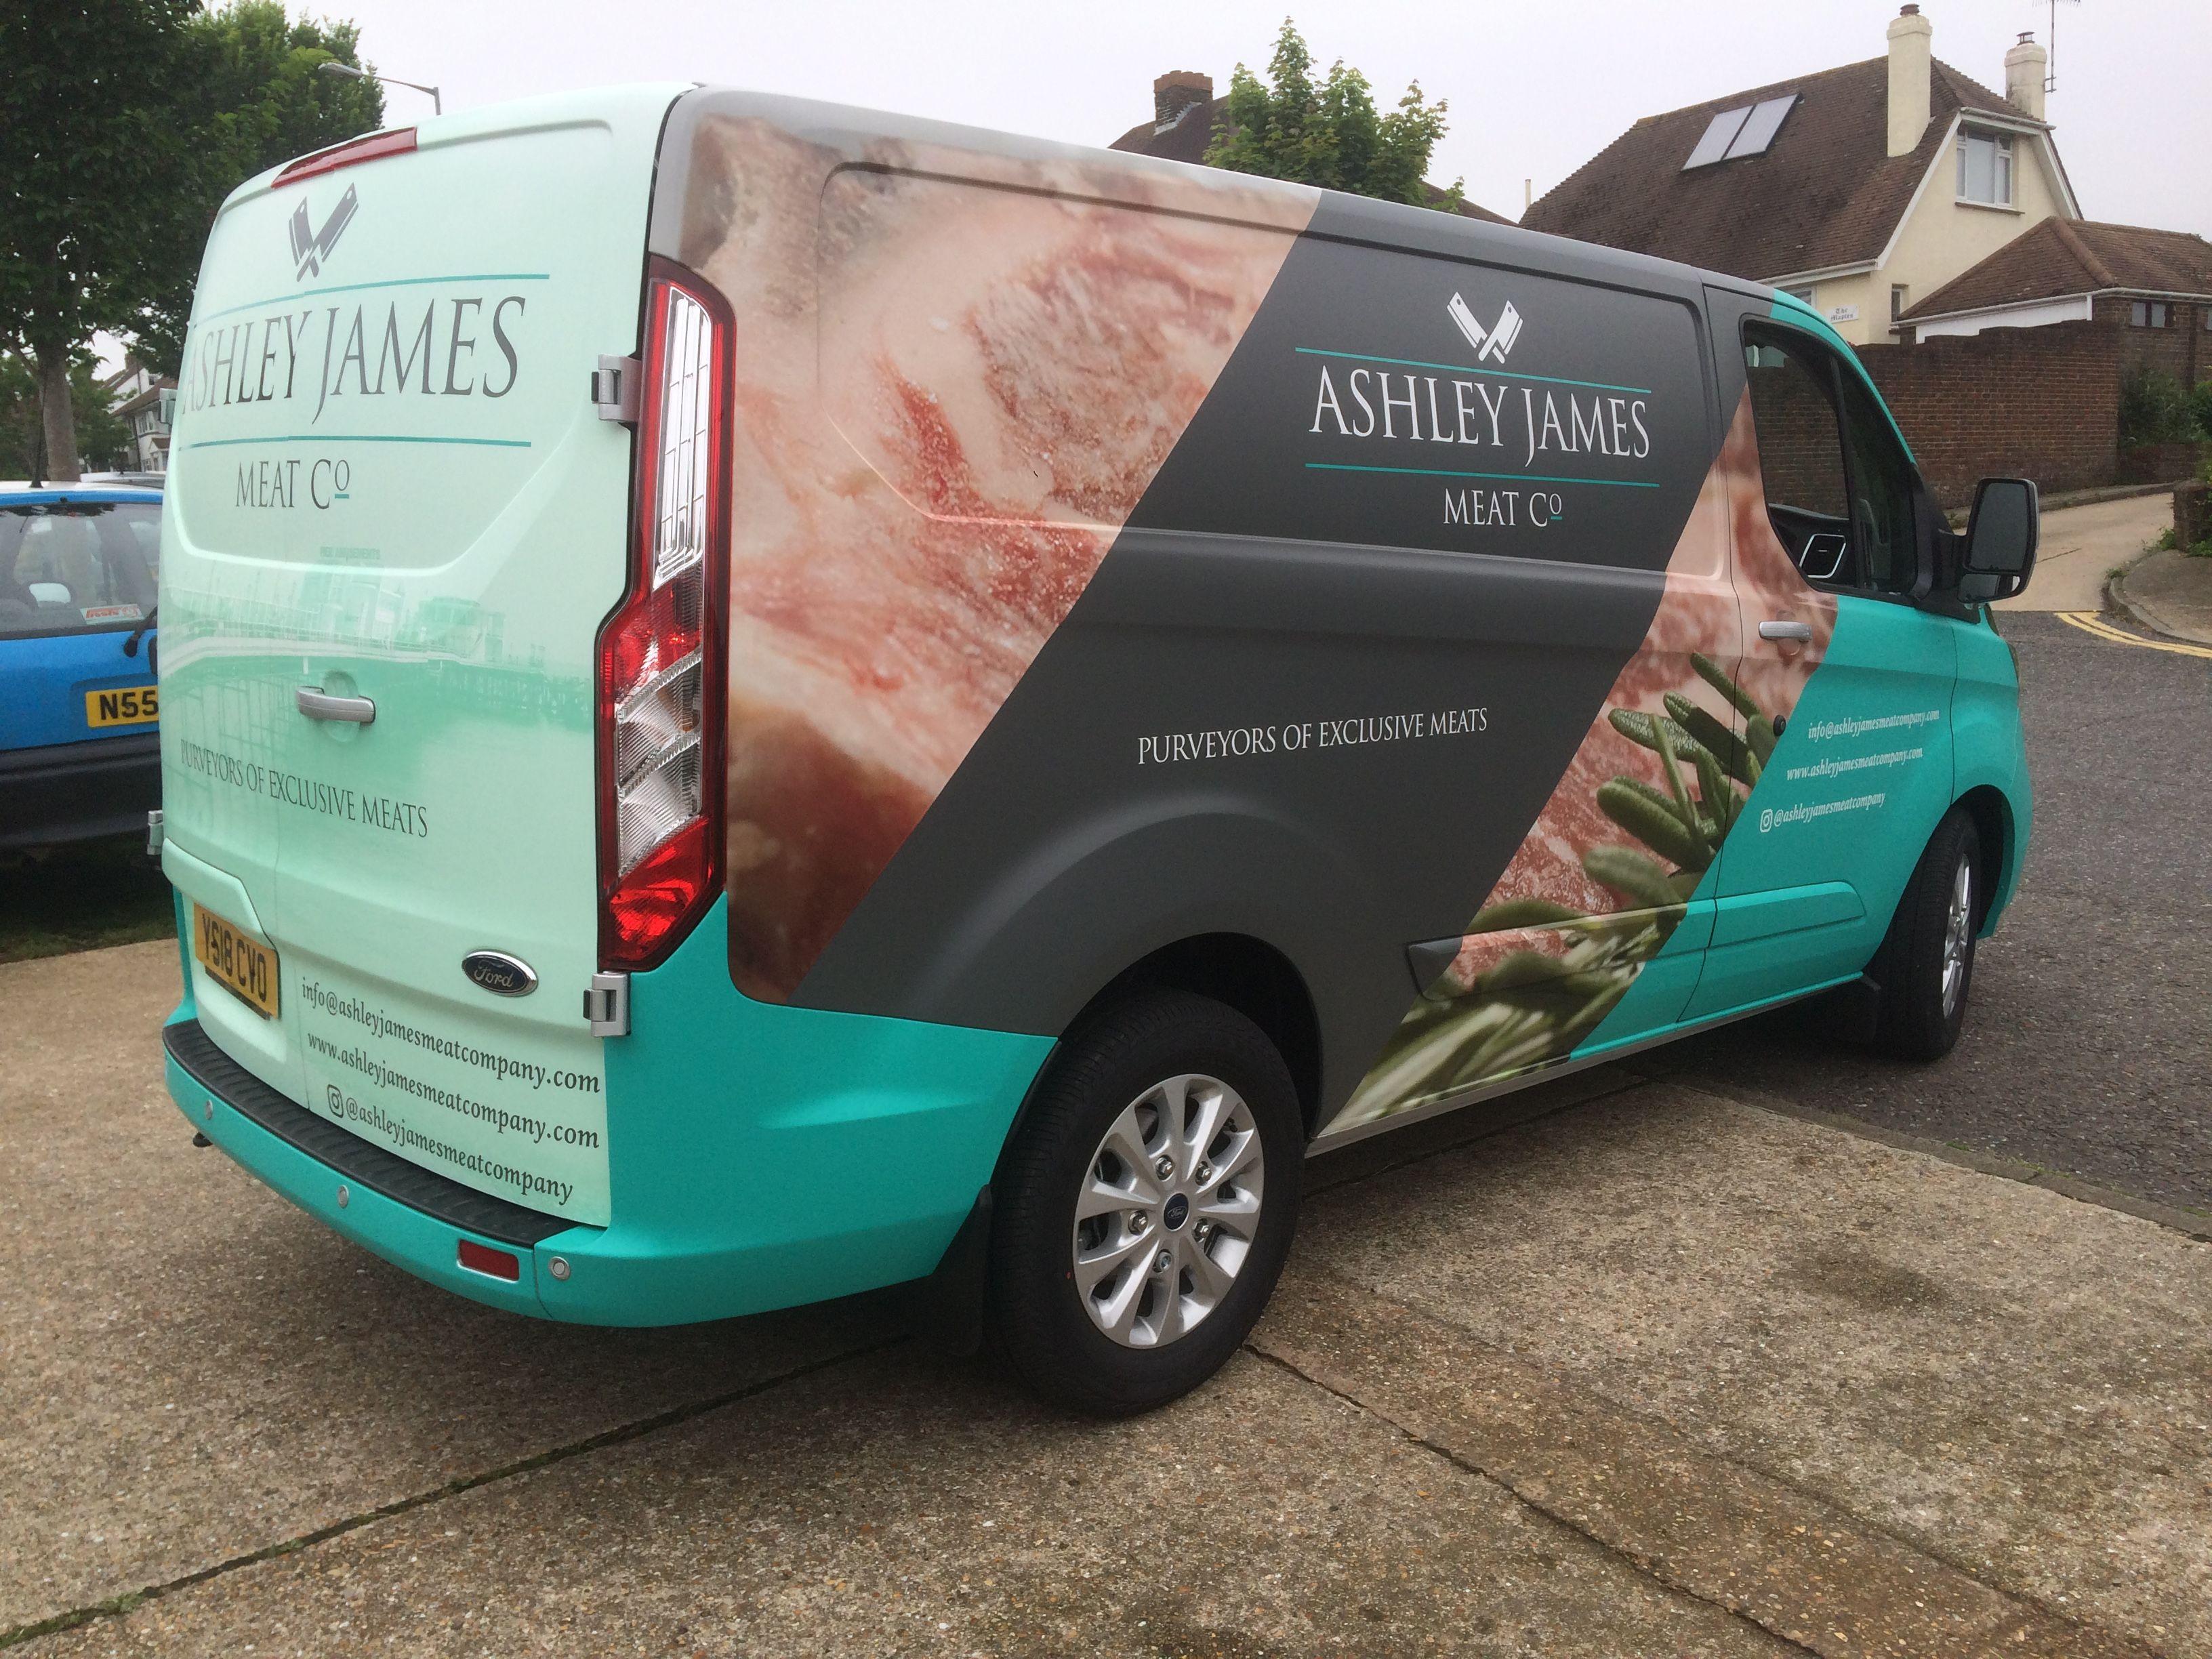 Full Vehicle Wrap With Digitally Printed Vinyl Graphics Creative Design That Mixes Gloss And Matt Vinyl To Create This Eye Catchi Van Design Car Wrap Bus Wrap